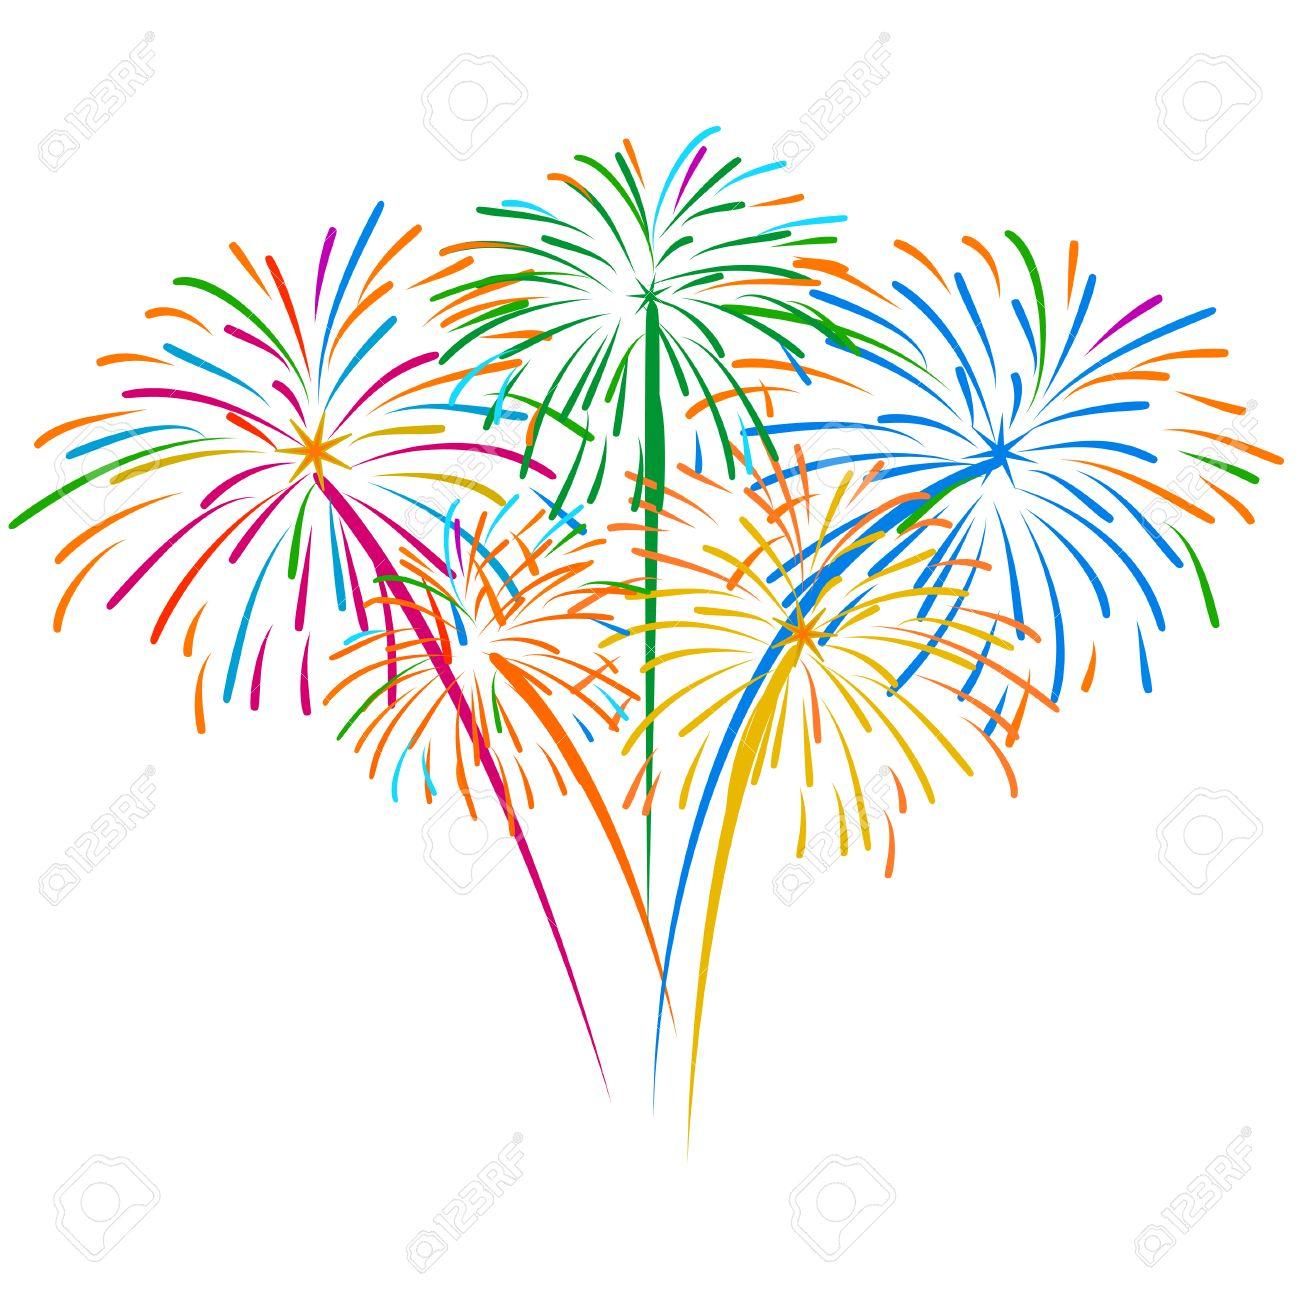 fireworks vector royalty free cliparts vectors and stock rh 123rf com Fireworks Clip Art Cartoon Fireworks Clip Art